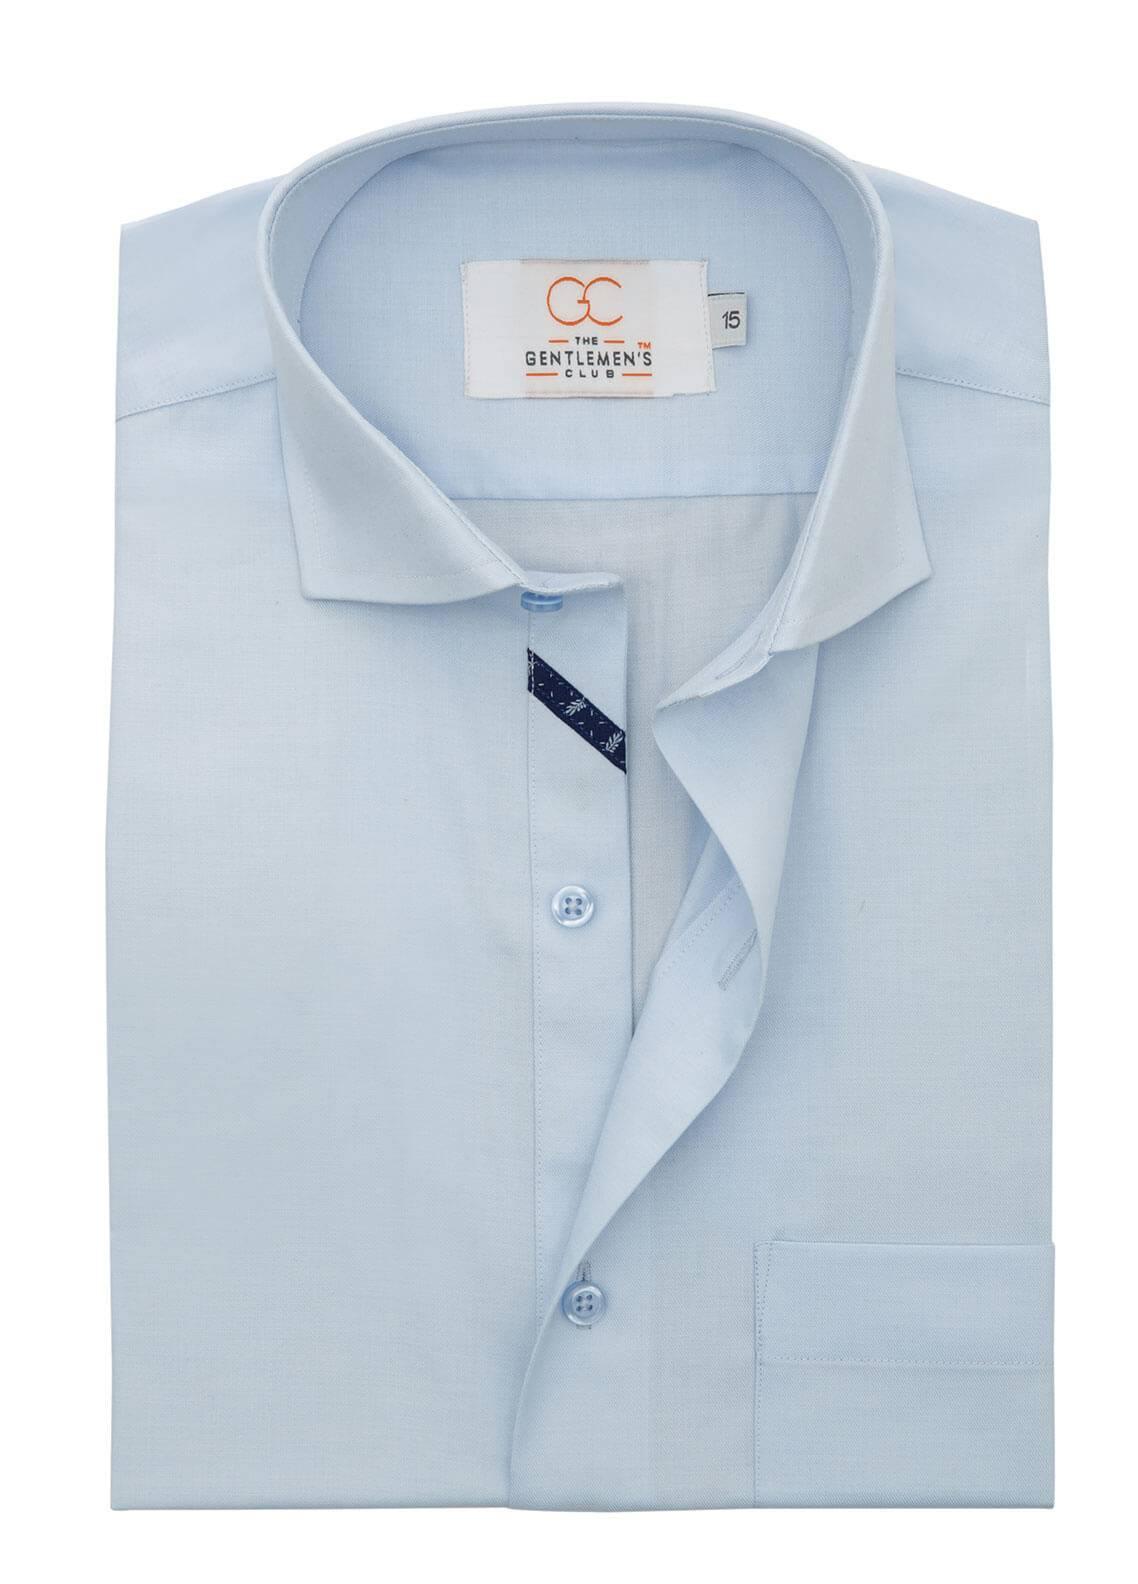 The Gentlemen's Club Cotton Formal Men Shirts - Sky Blue White Label 4086 - 17.5